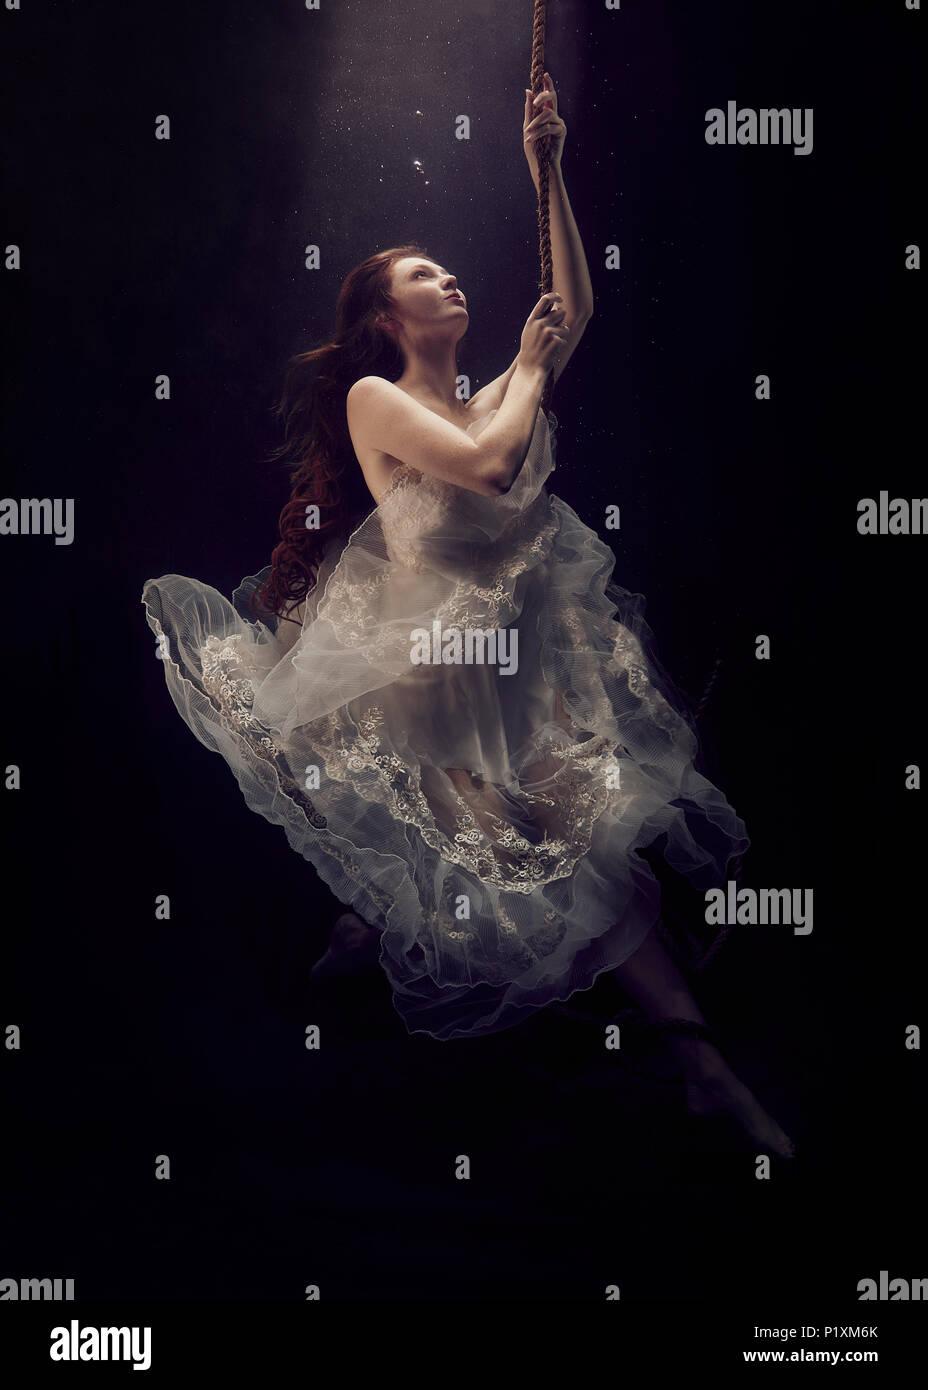 Underwater Fairytale - Stock Image